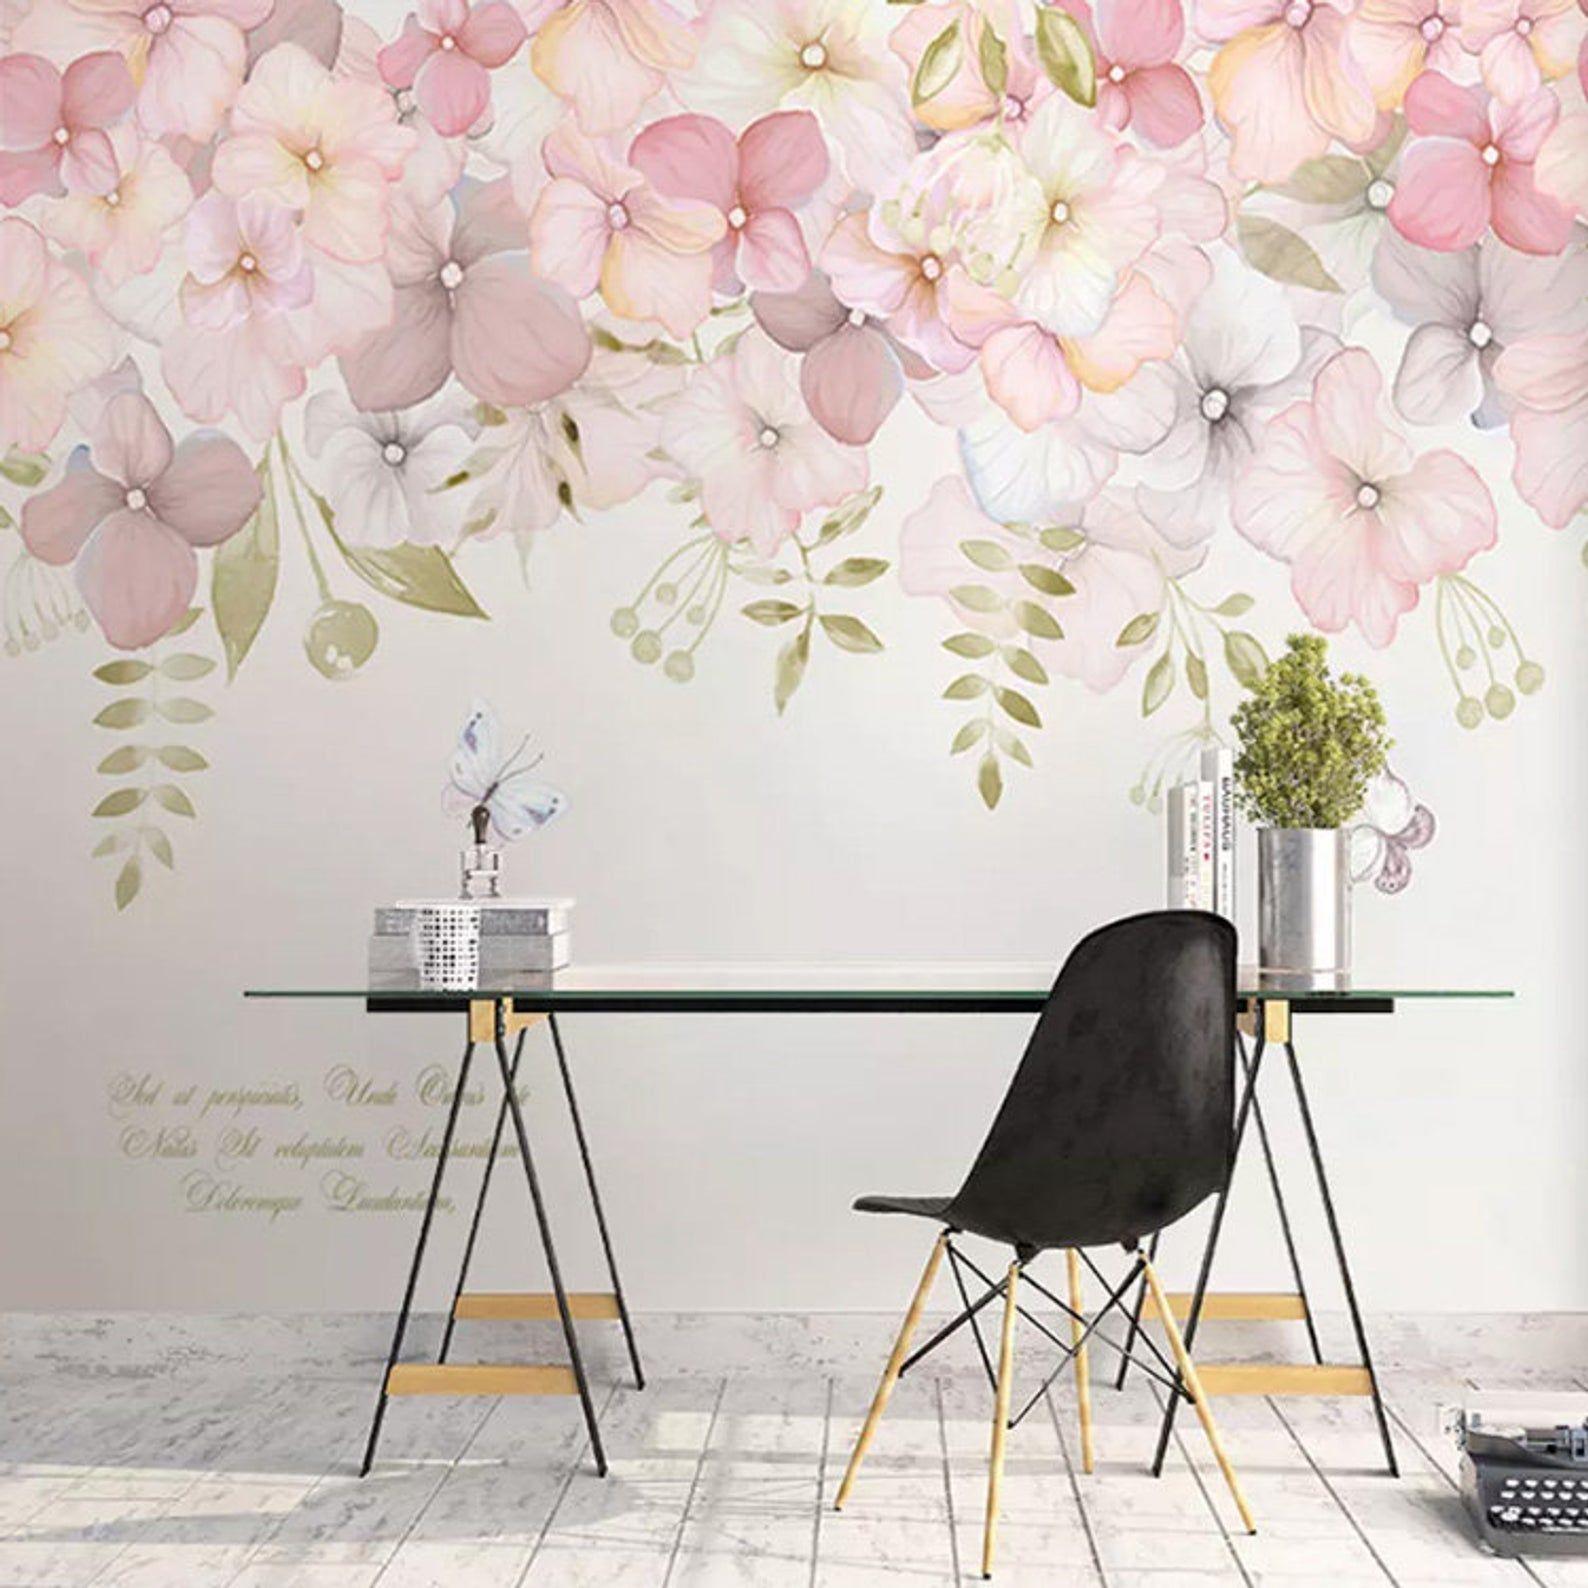 Watercolor Pink Flowers Wallpaper Wall Mural, Hanging